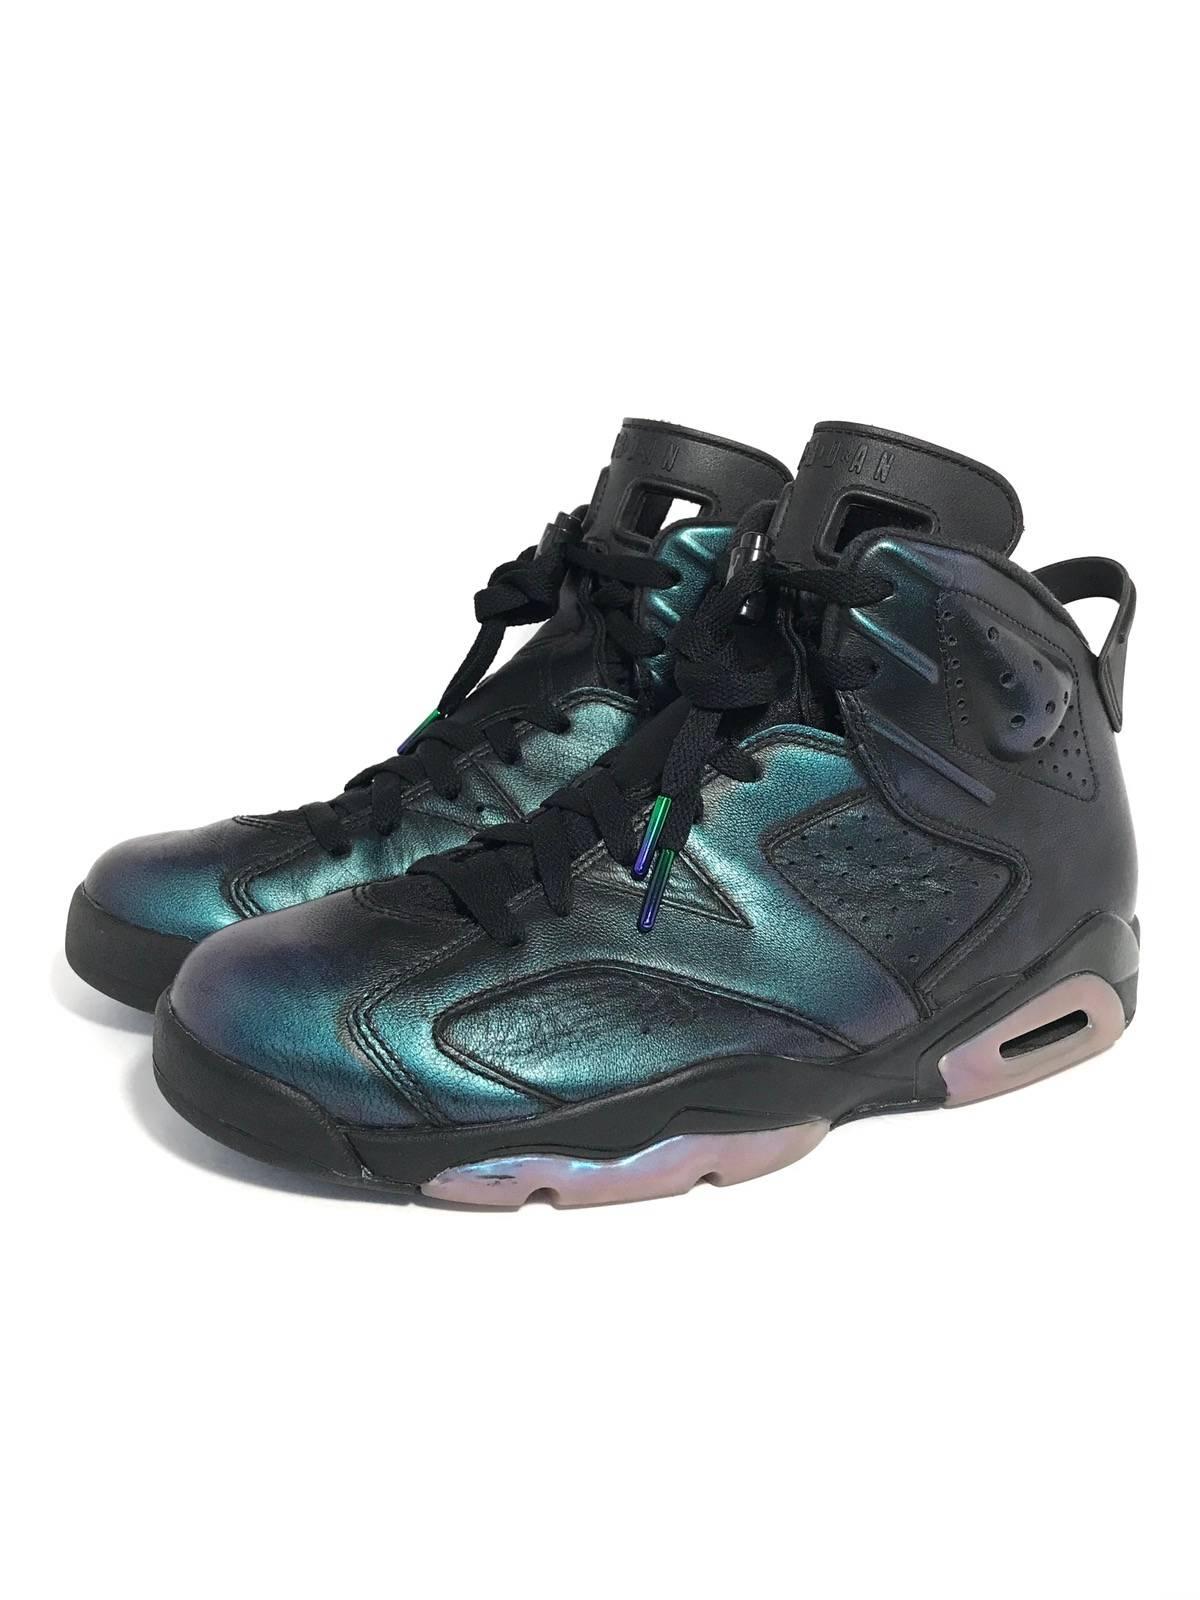 on sale e104a b1af3 Nike × Jordan Brand ×. Air Jordan 6 Retro All Star Chameleon